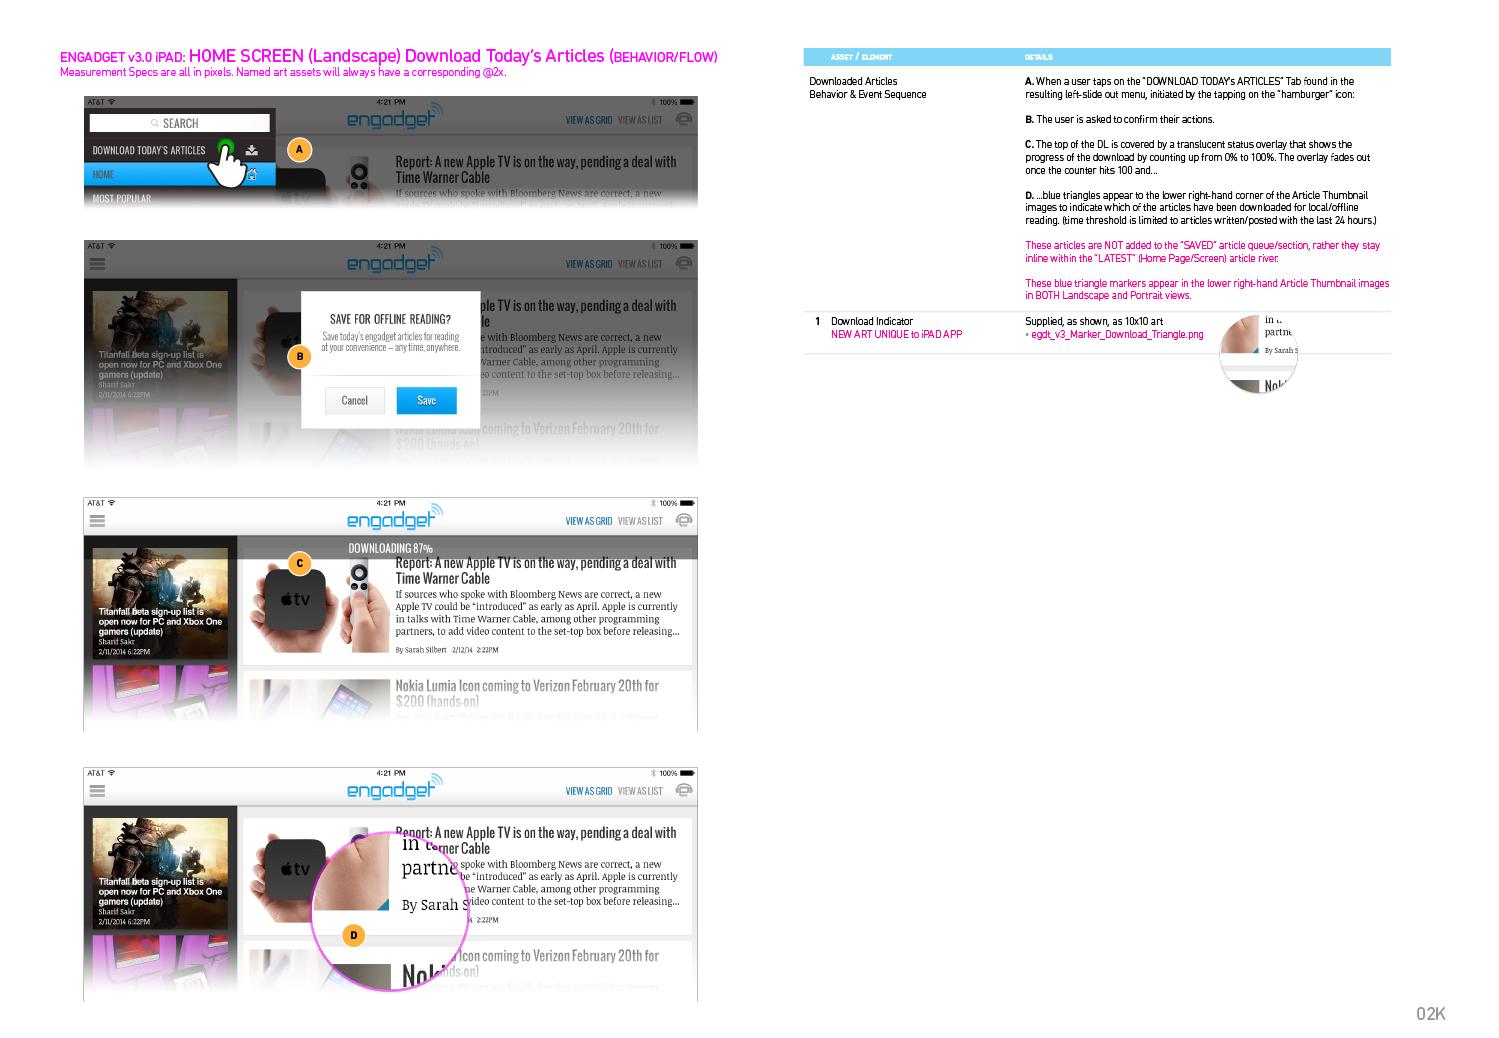 Engadget_iPad_DesignSpecs_Sample-5.jpg